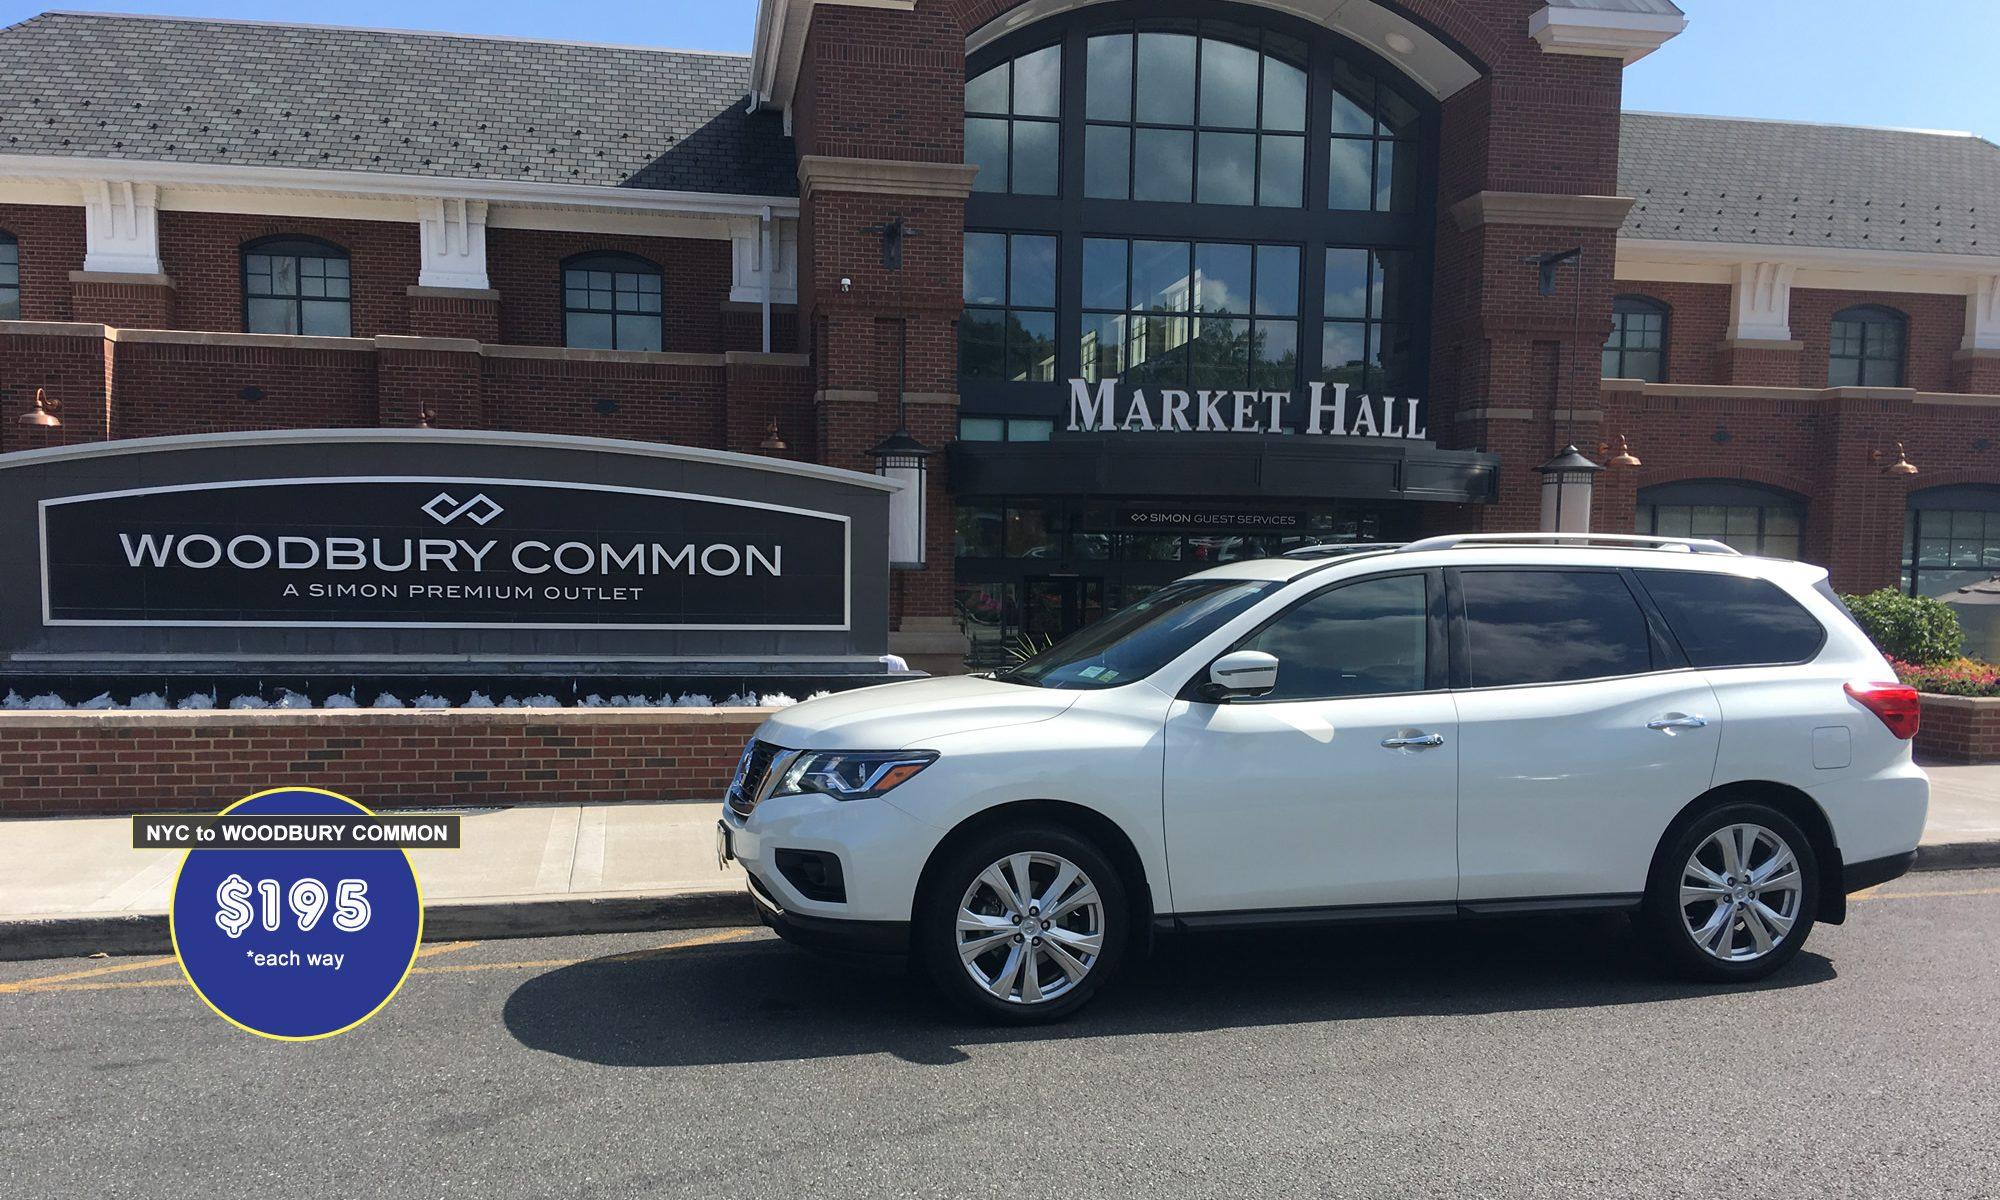 Woodbury Common Transportation